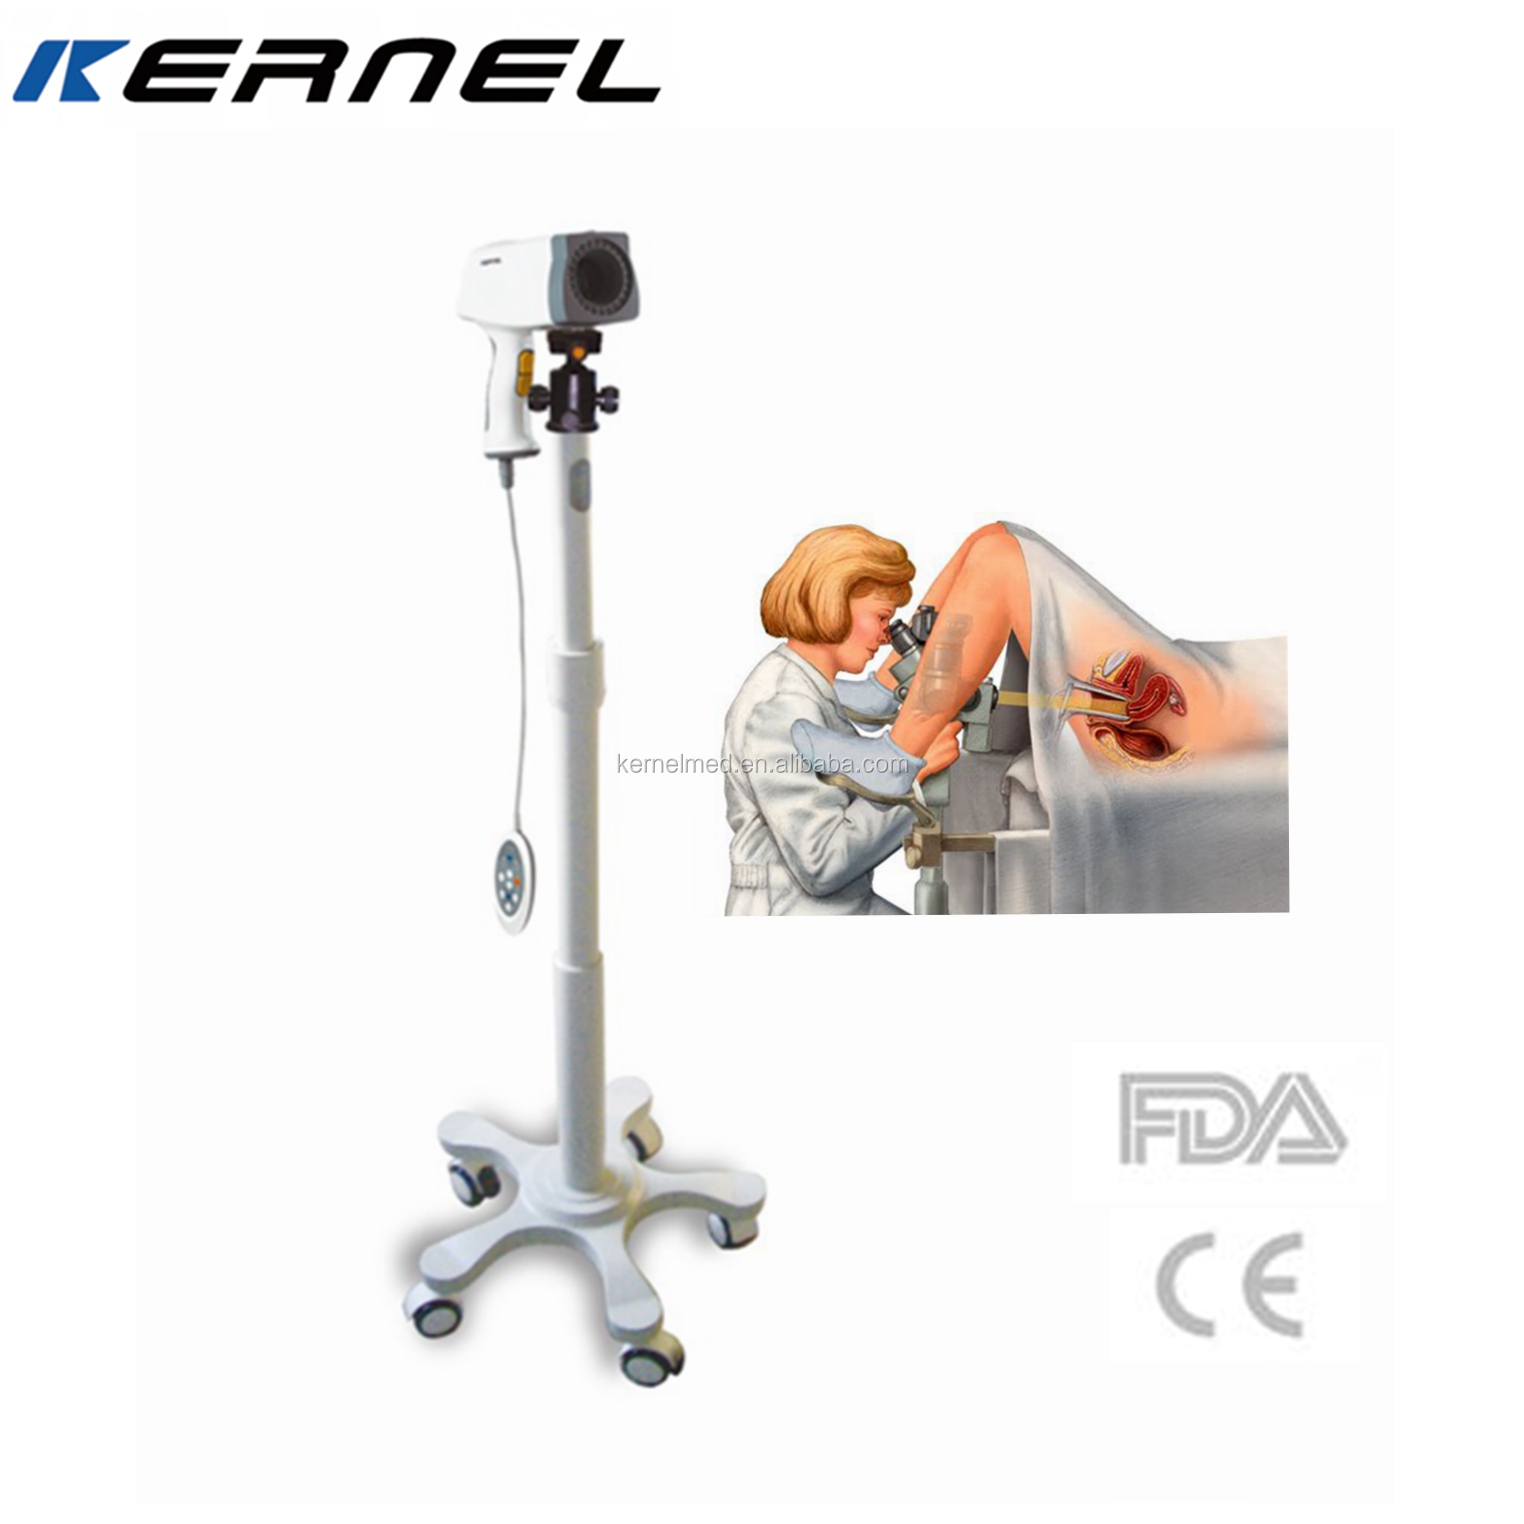 Handheld Colposcope Kernel Kn-2200 Digital Video